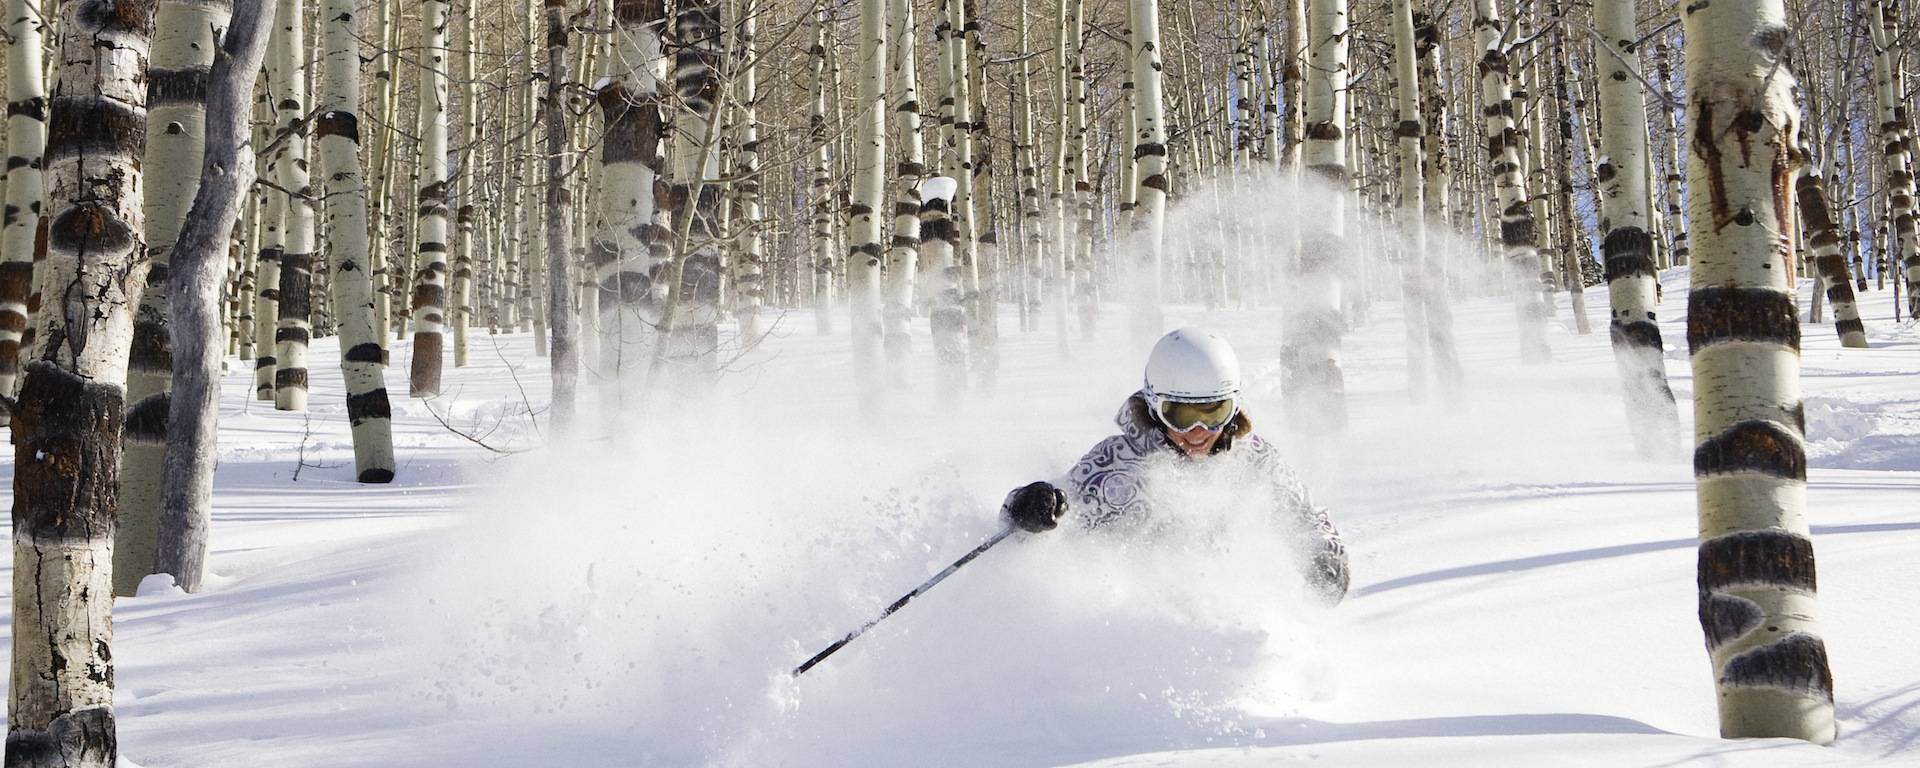 Ogden Skiing